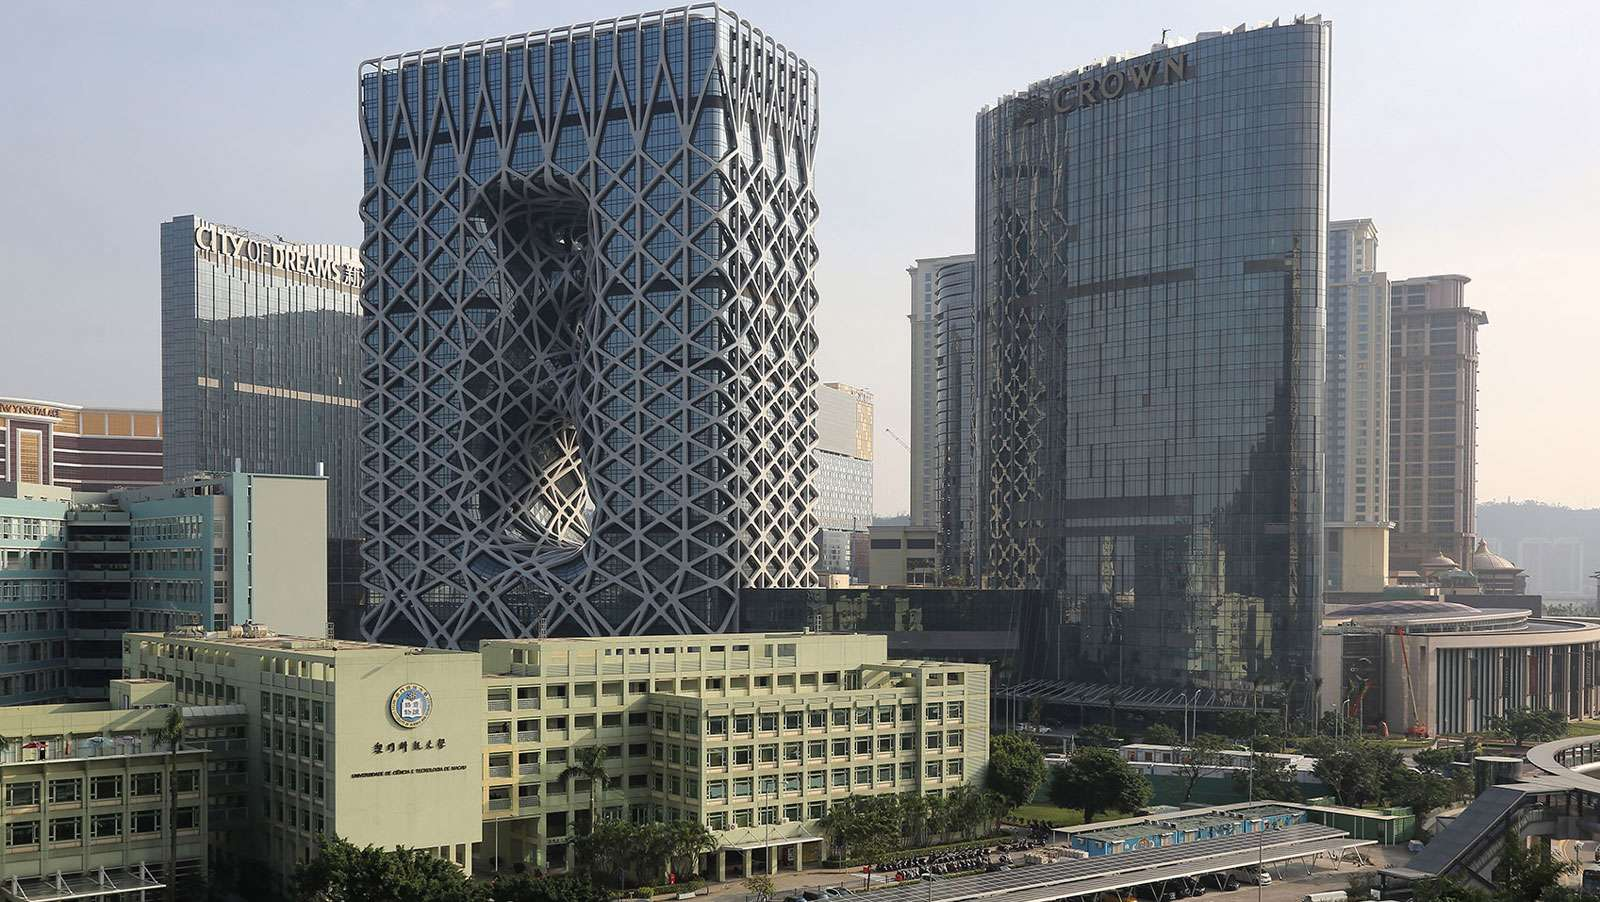 Macau christens casino designed by famed architect Zaha Hadid